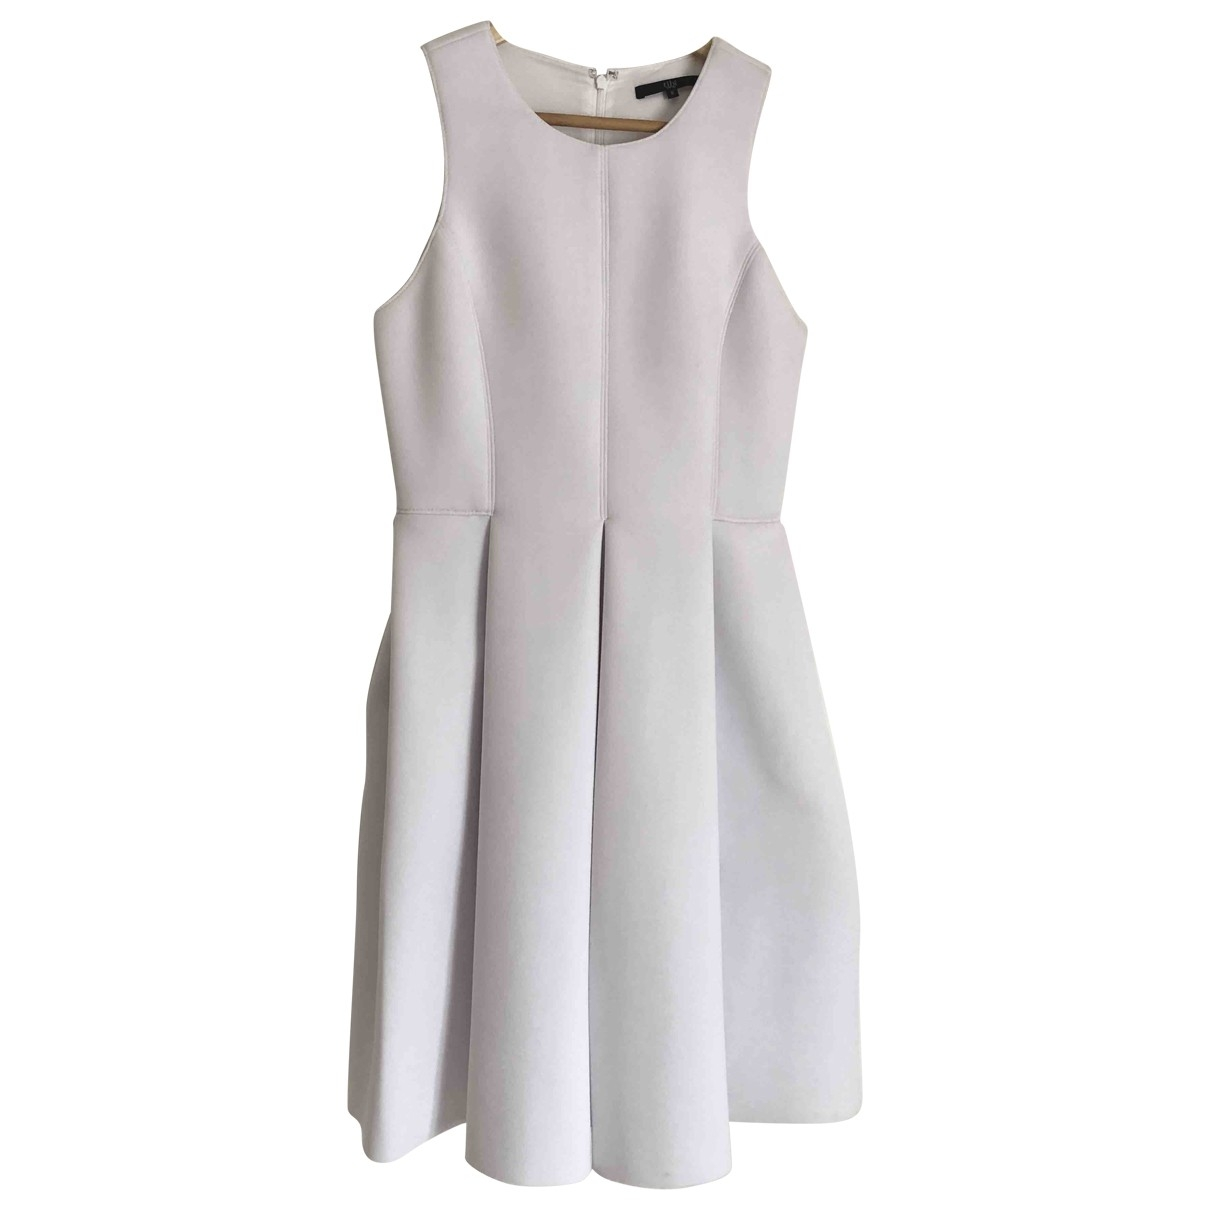 Tibi \N Kleid in  Weiss Polyester